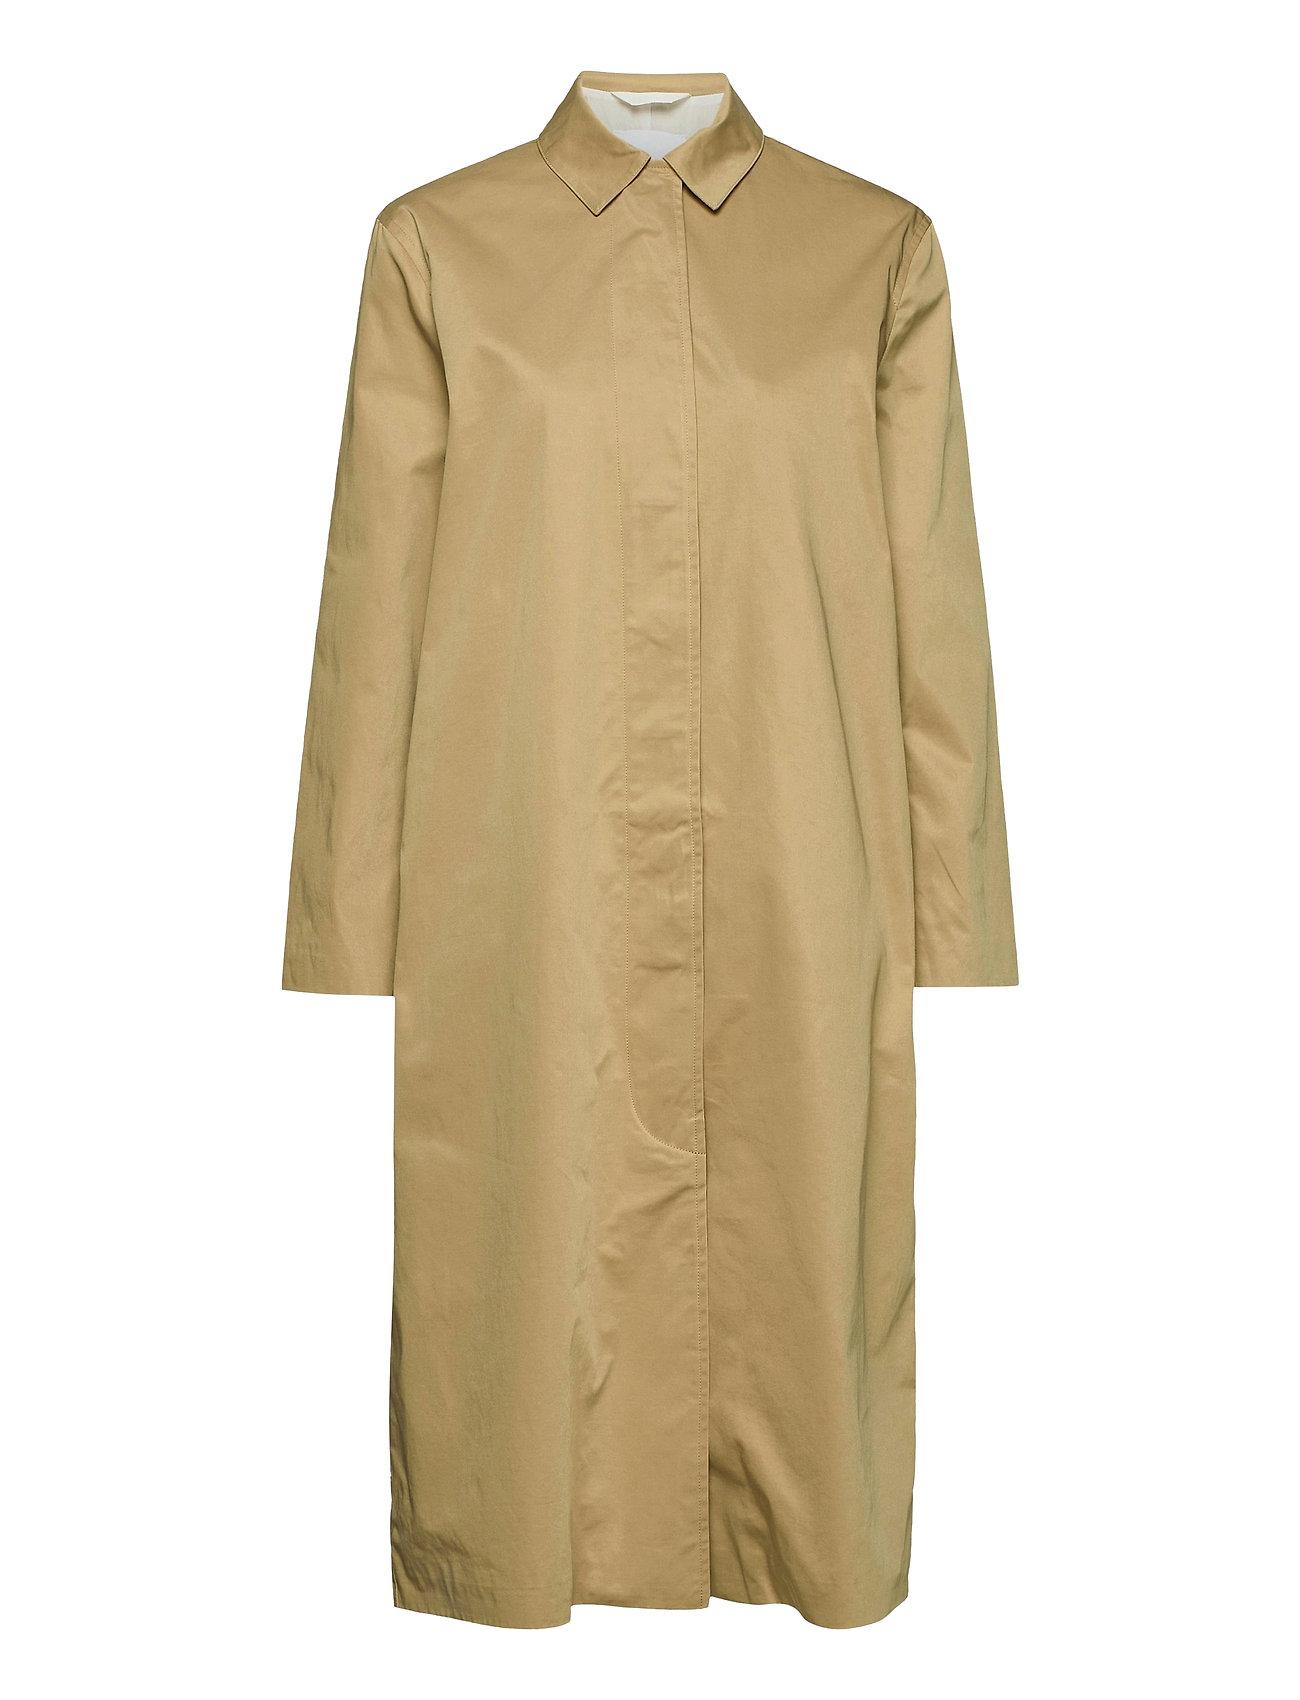 Samsøe Samsøe Minoux coat 12681 - CROISSANT